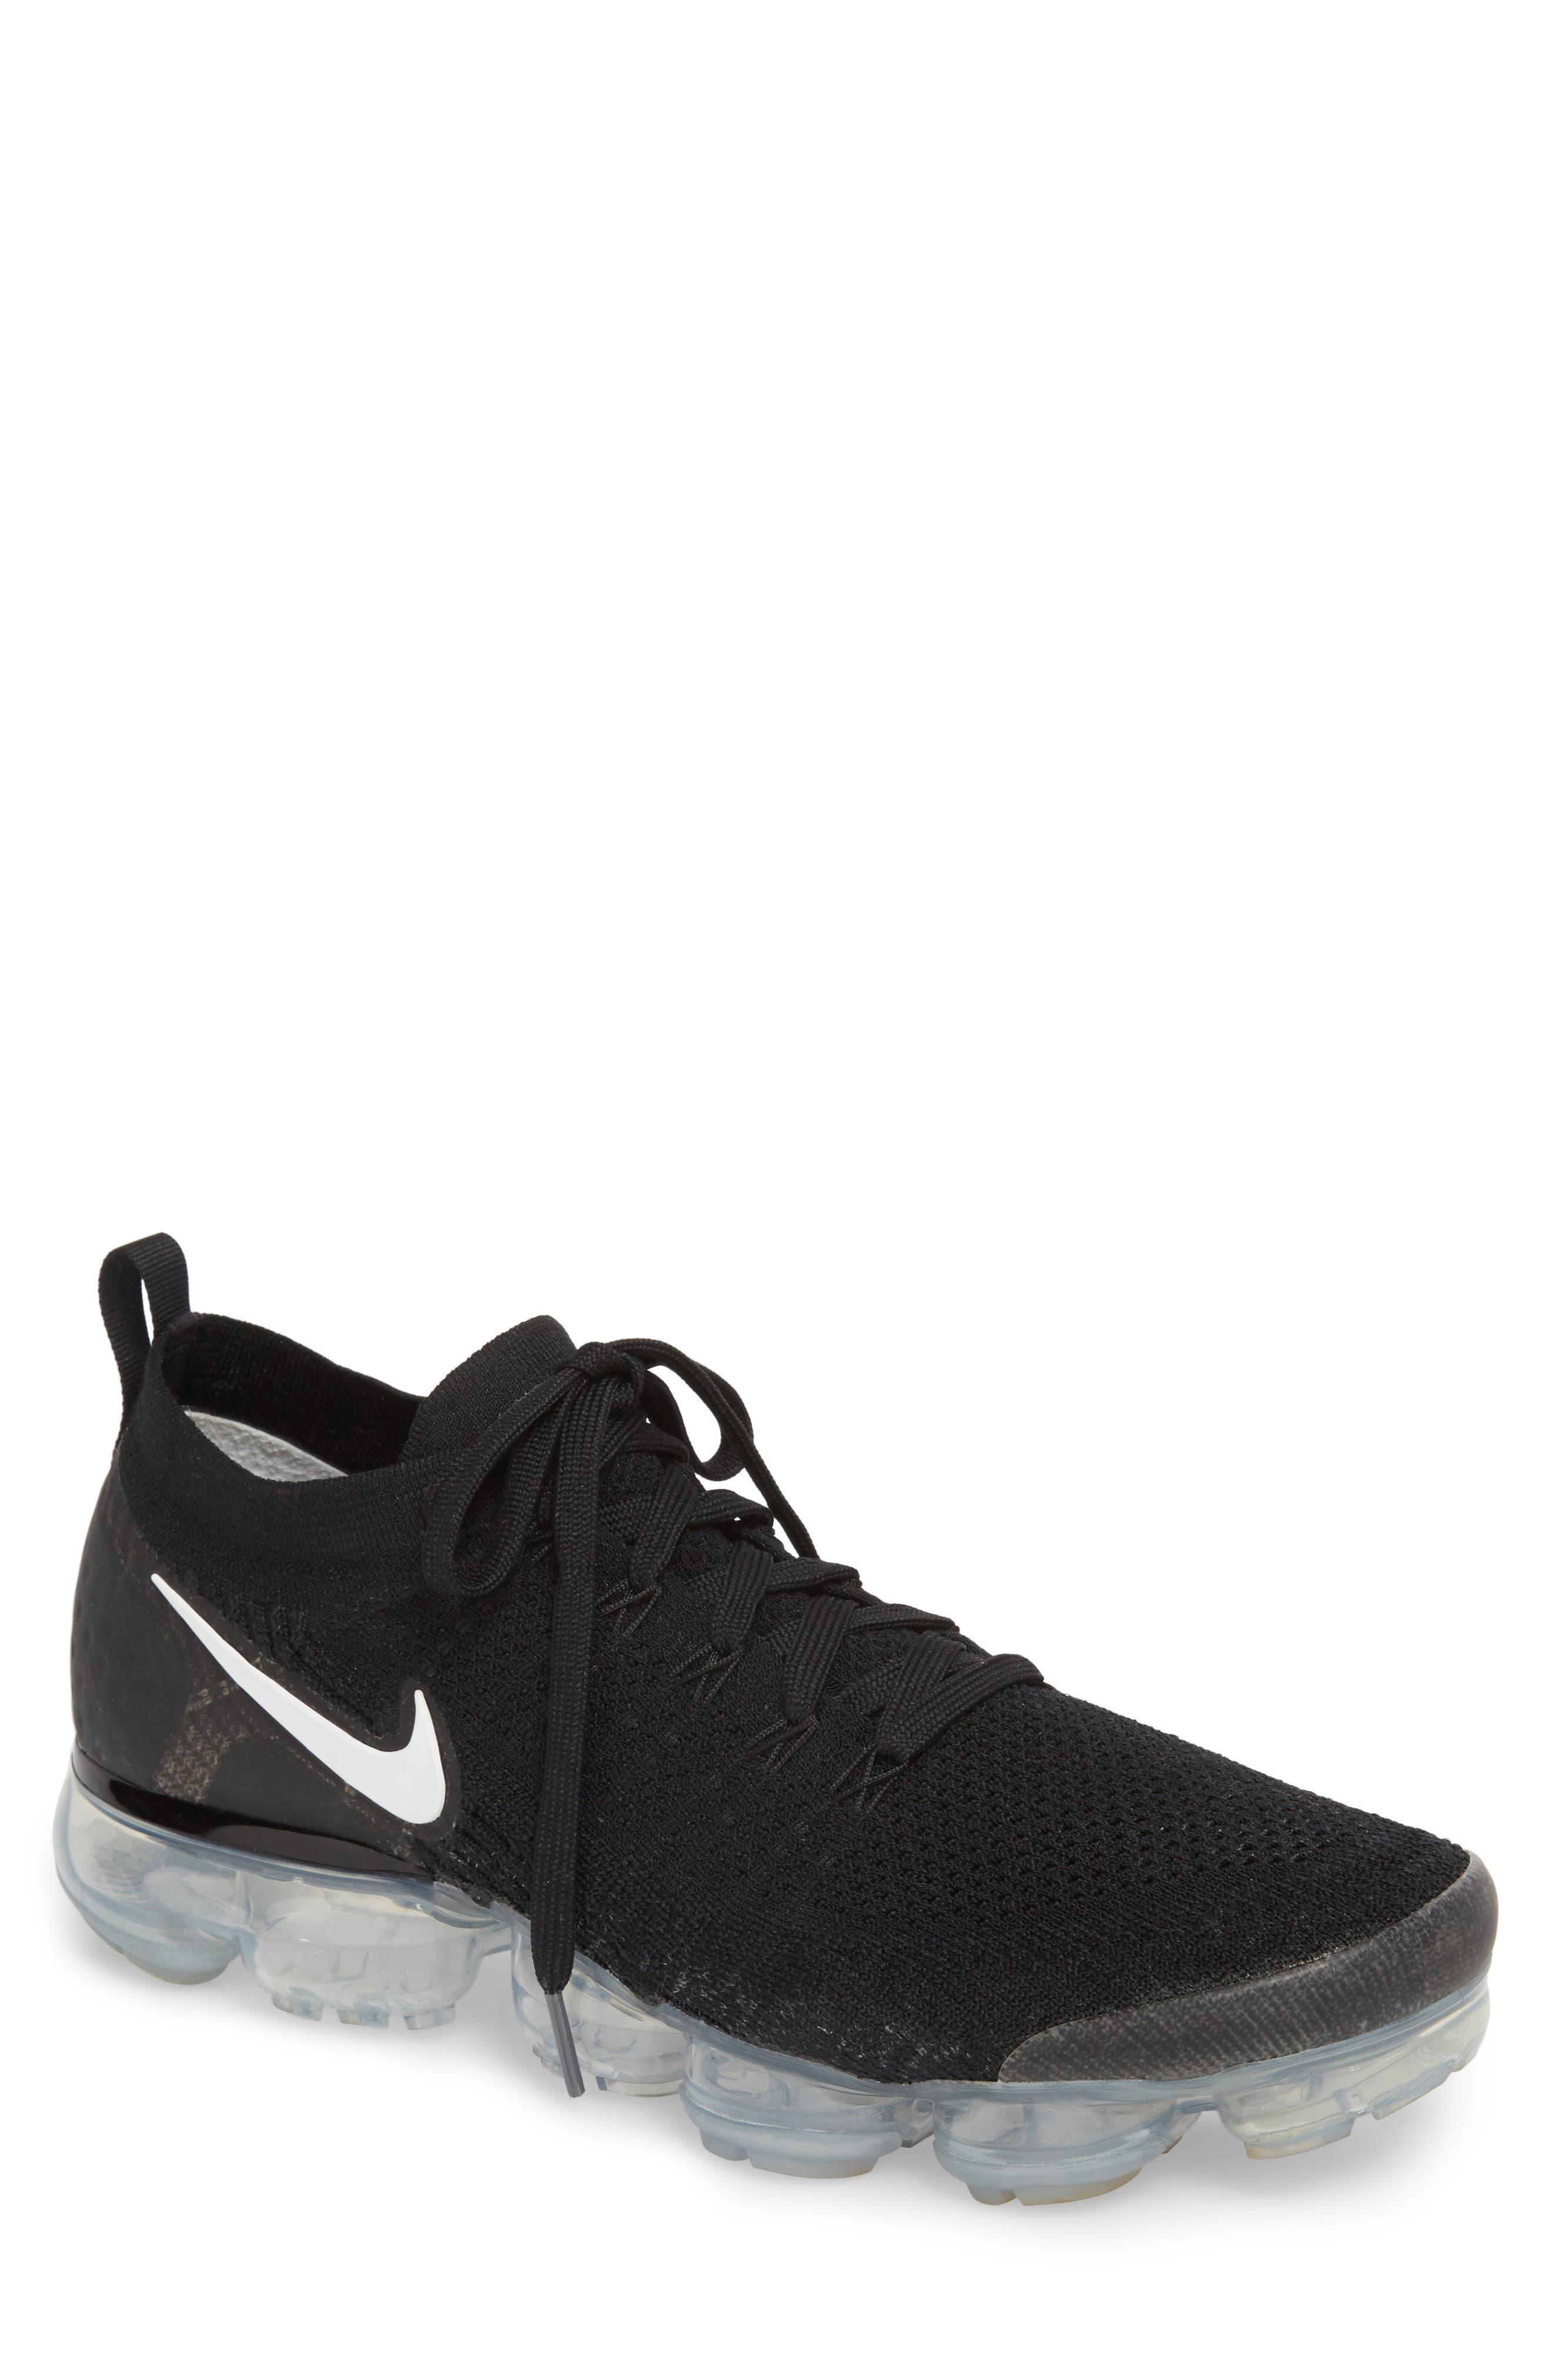 Air Vapormax Flyknit 2 Running Shoe,                         Main,                         color, Black/ White/ Dark Grey